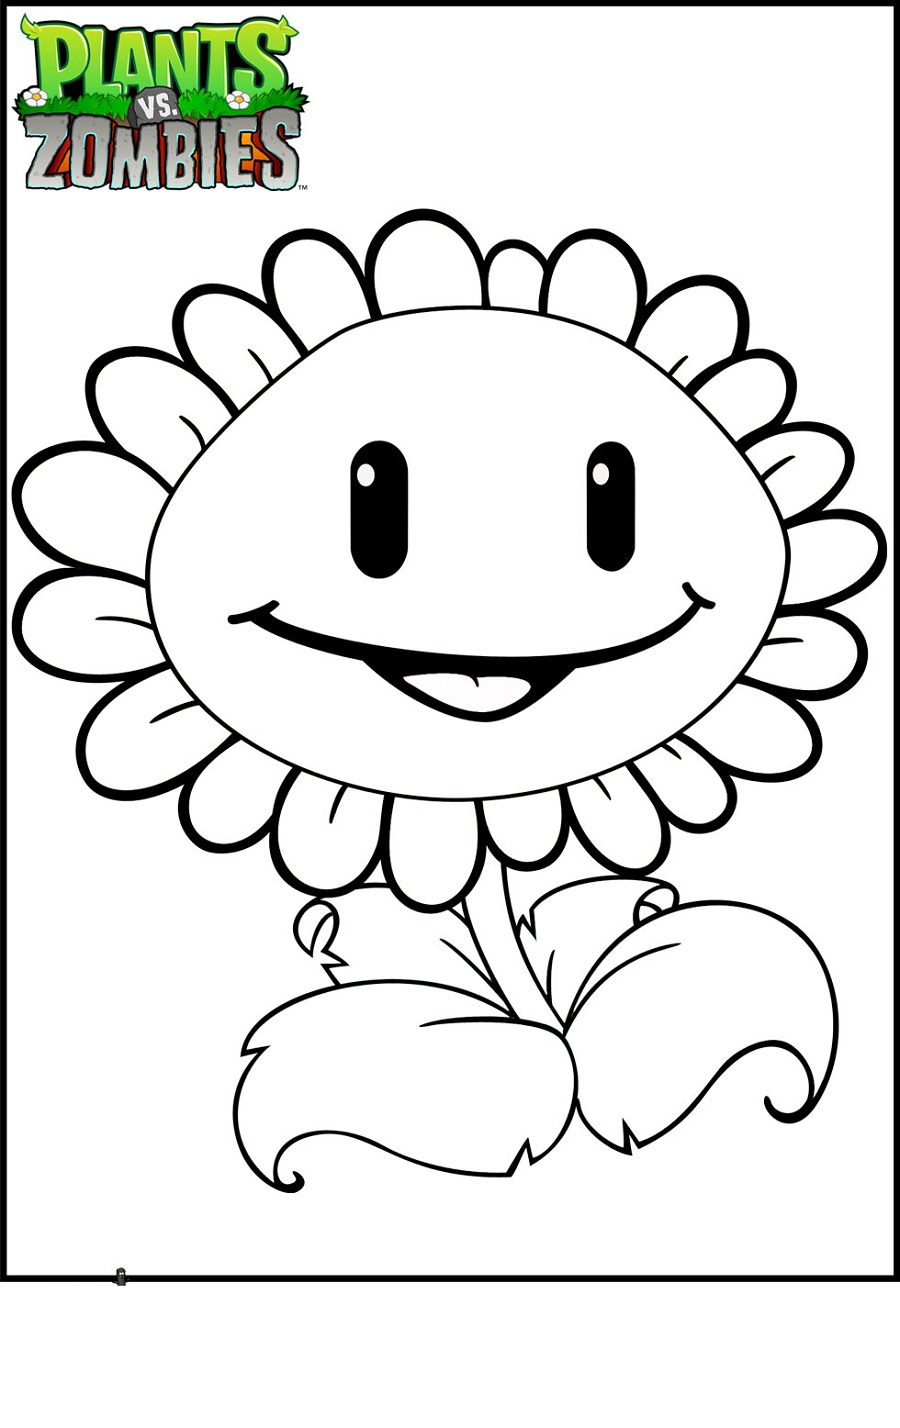 plants vs zombies coloring pages Sun flower